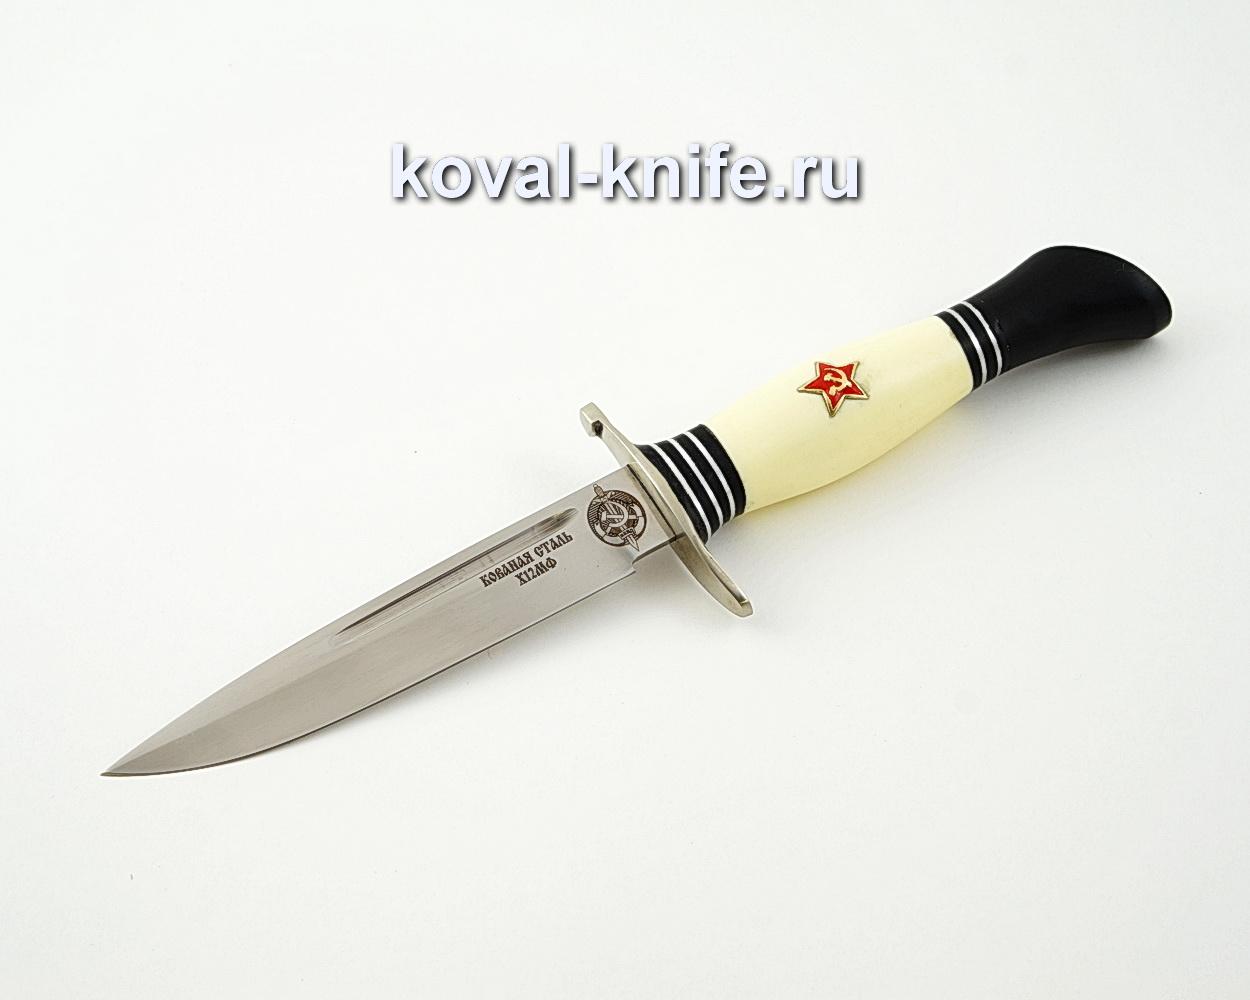 Нож Финка из кованой стали х12мф с рукоятью из пластика A587